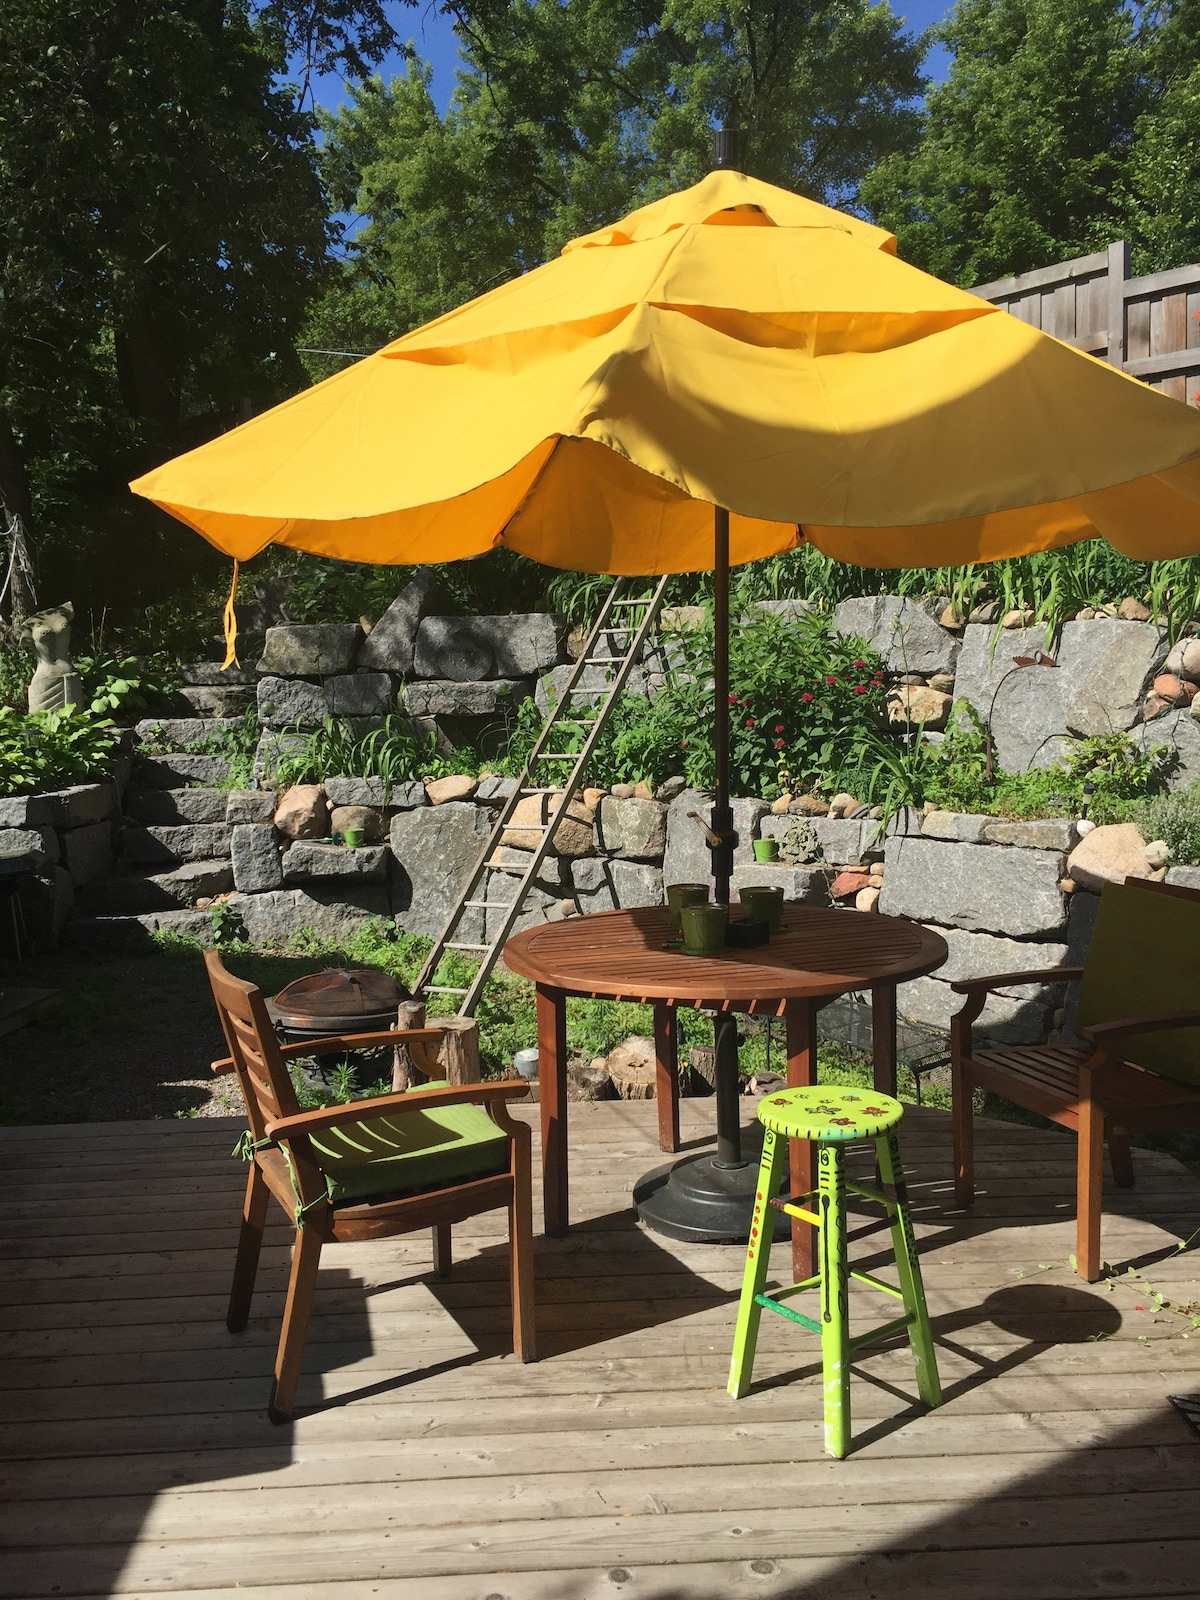 Brooklyn Park 2017: Top 20 Brooklyn Park Vacation Rentals, Vacation Homes U0026  Condo Rentals   Airbnb Brooklyn Park, Minnesota, United States